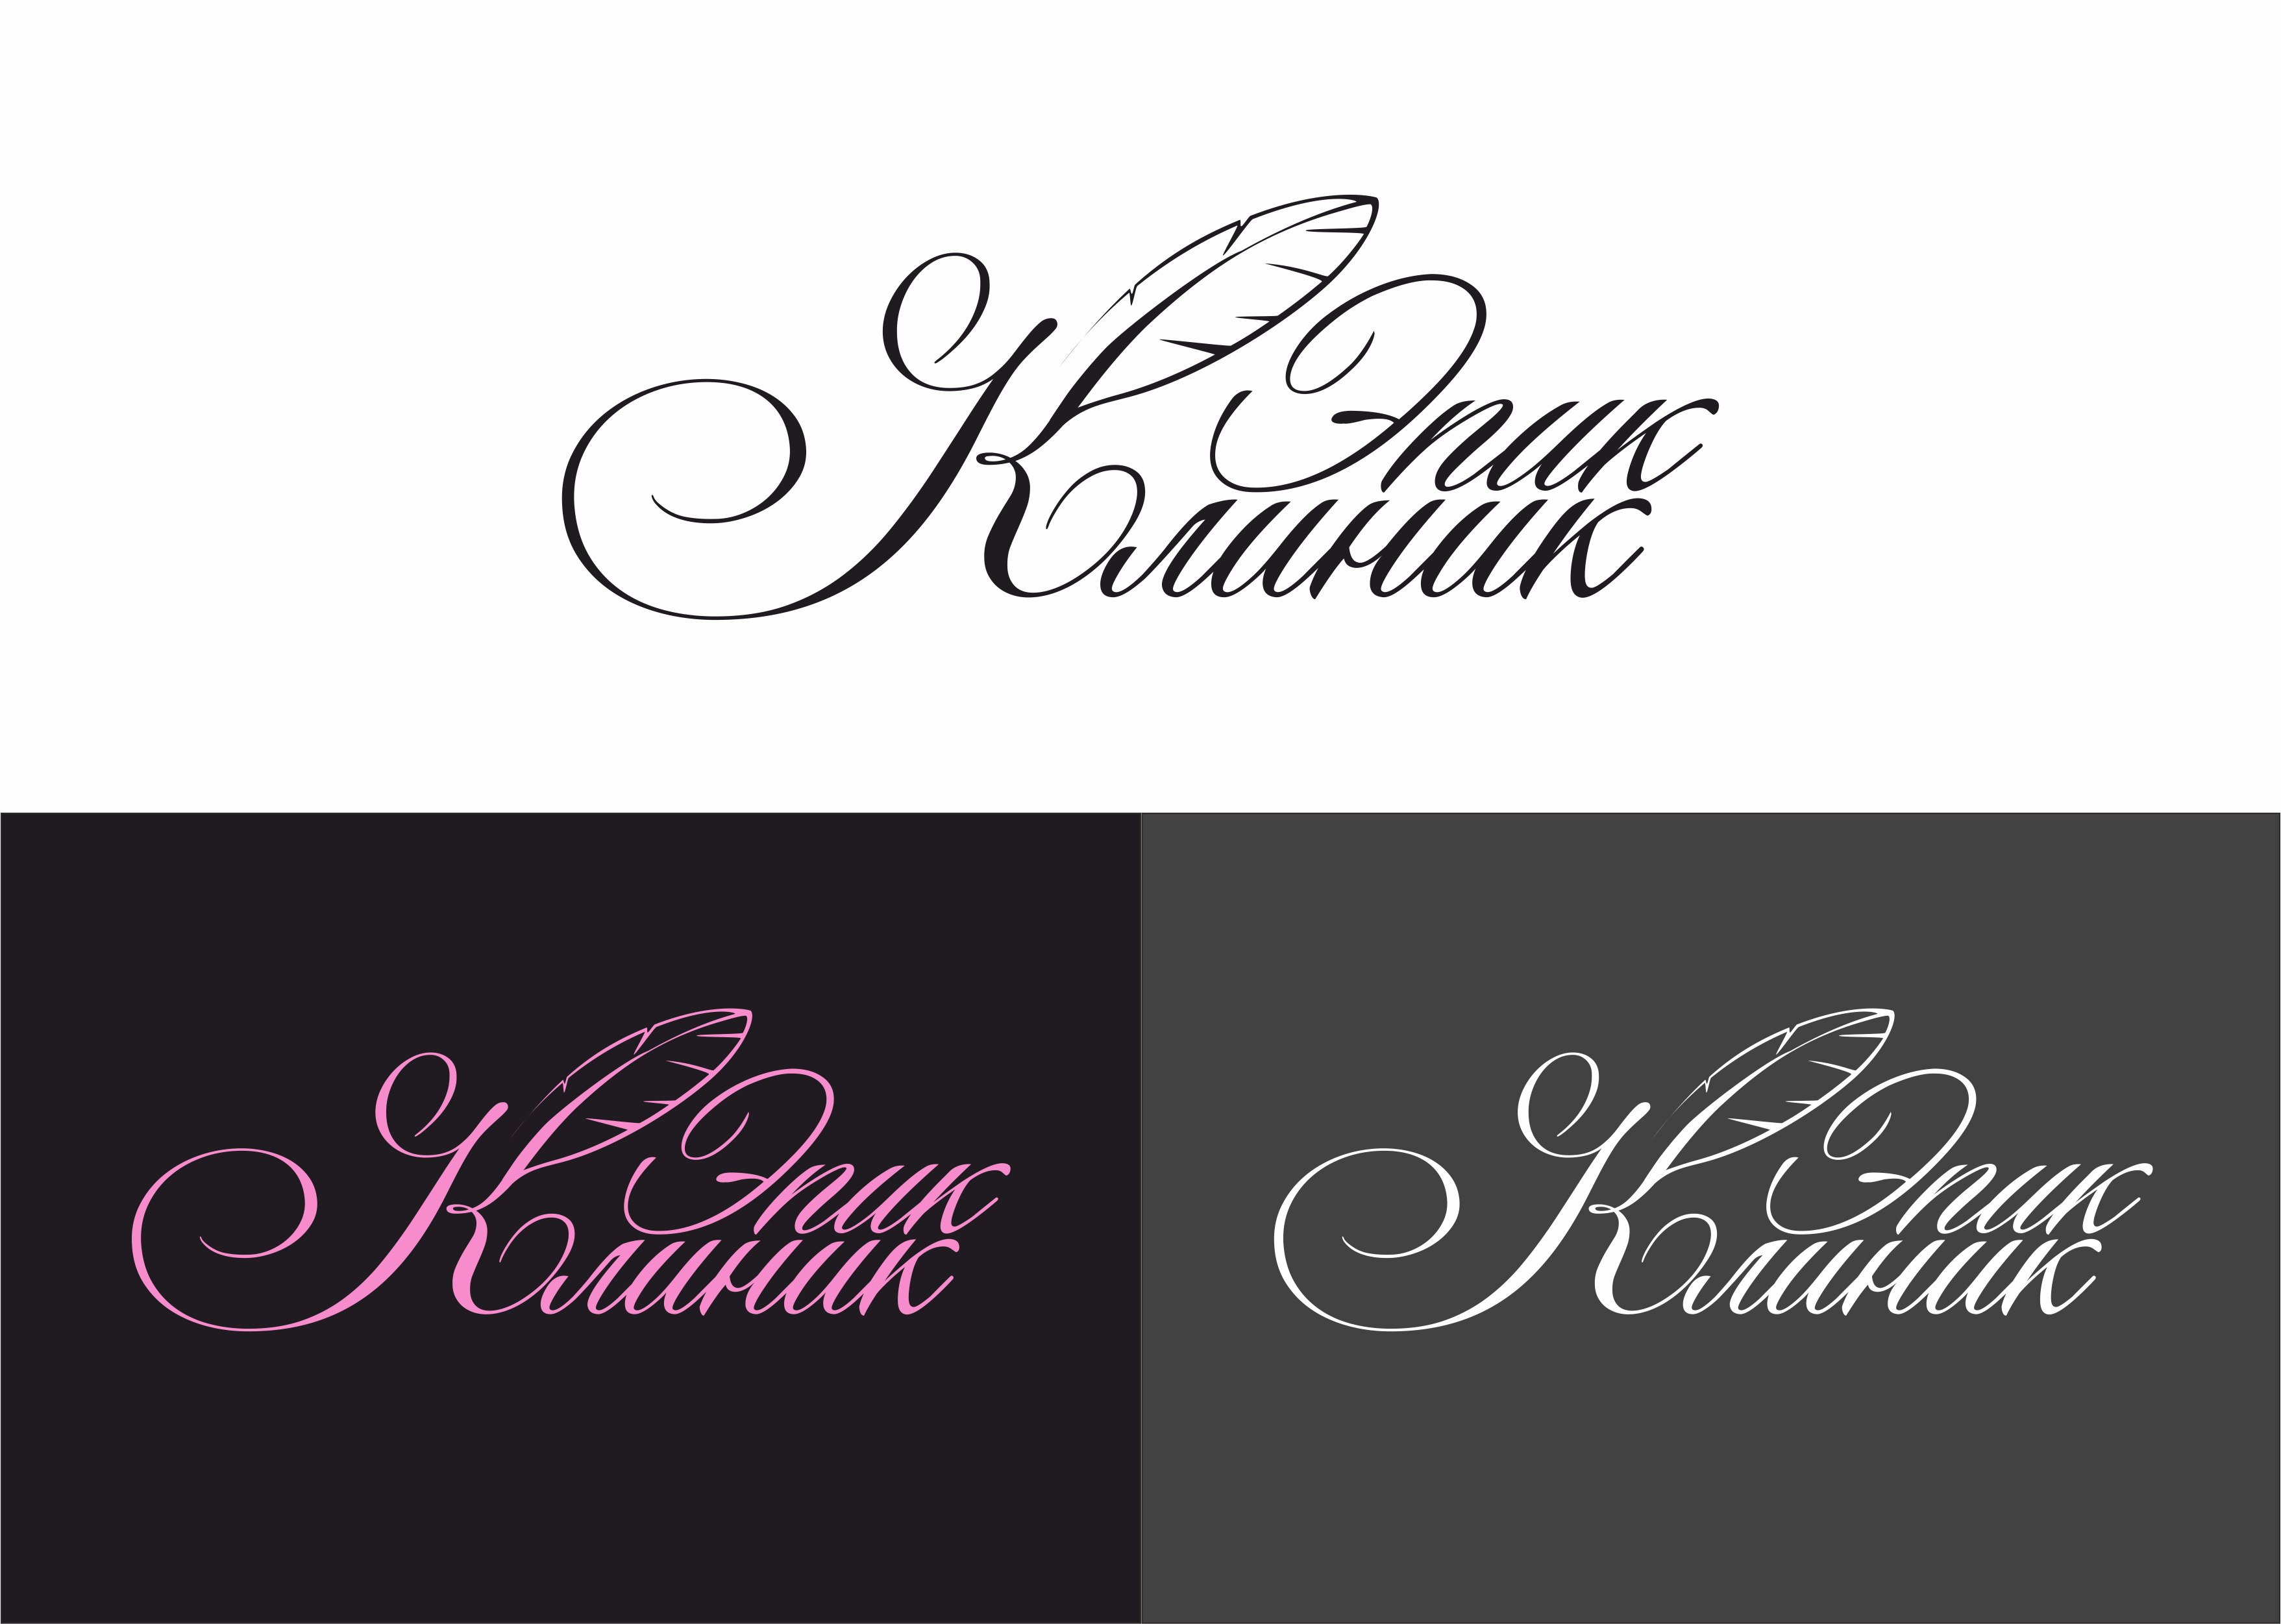 Логотип , фирменный стиль  фото f_0315e178f3398613.jpg